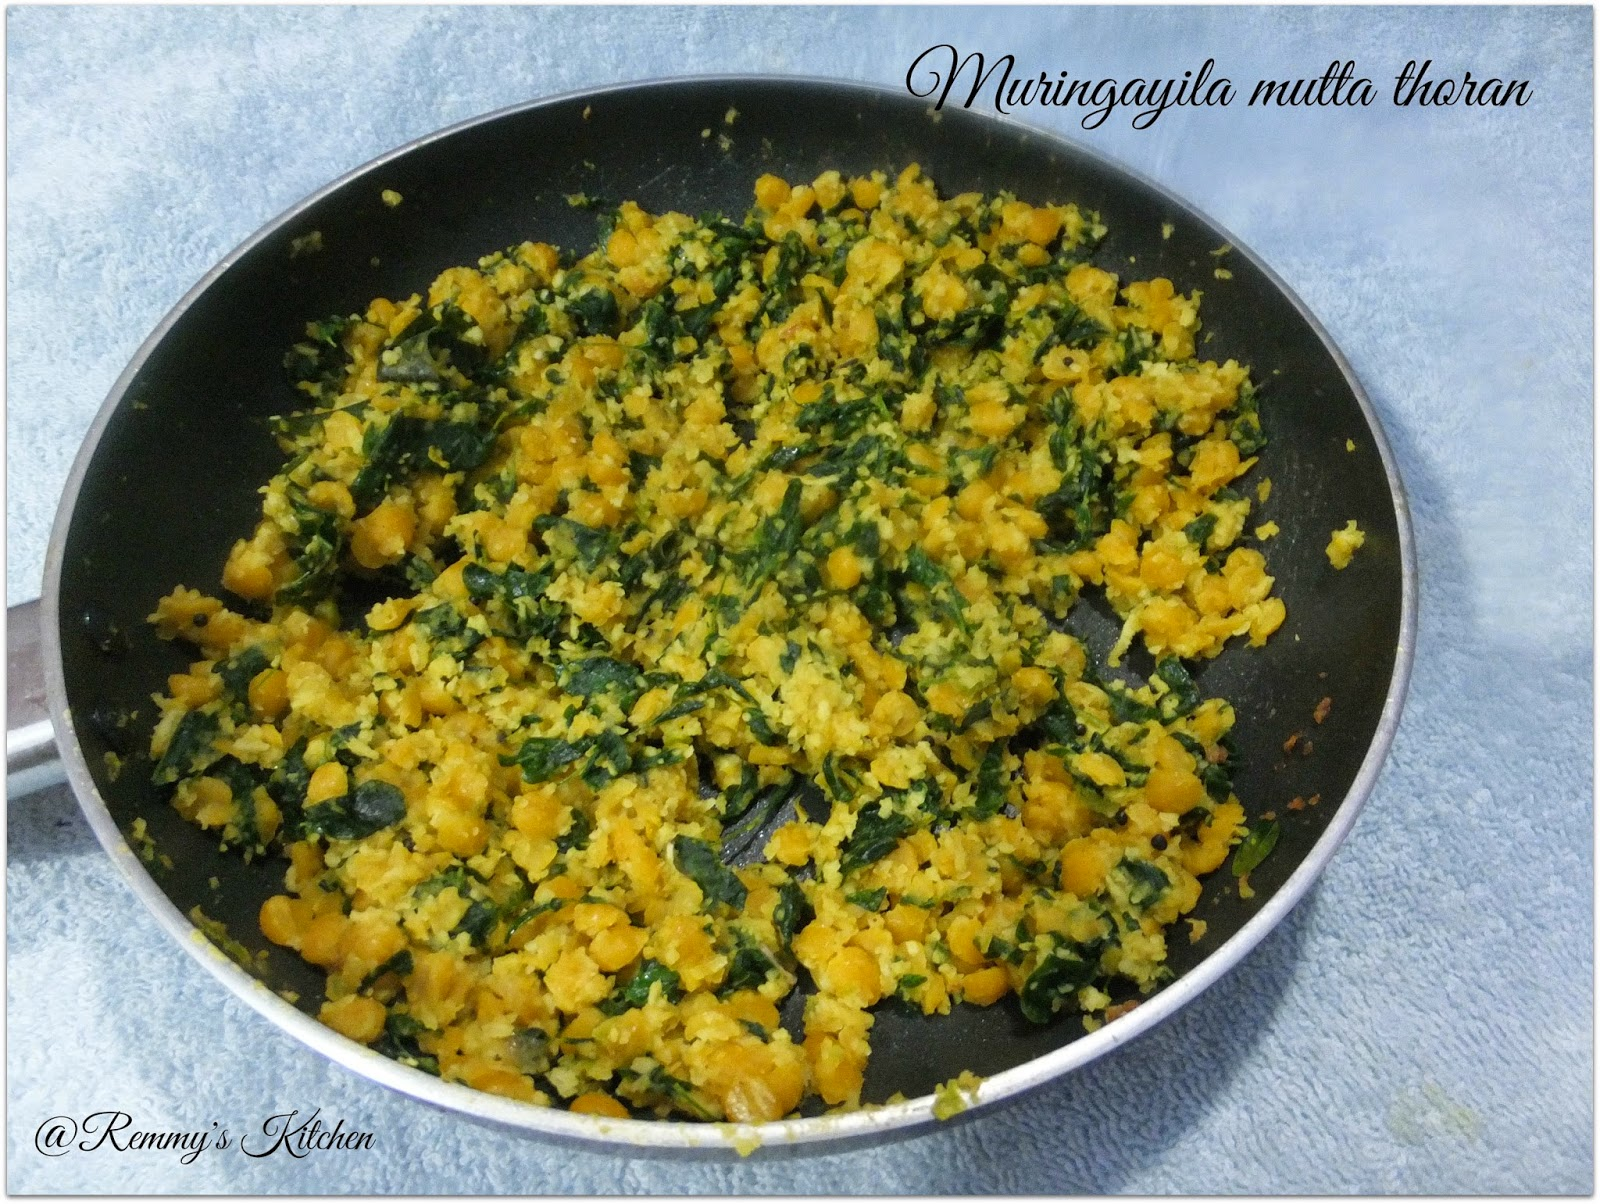 Muringa ila paripu thoran / Drumstick leaves lentil stir fry